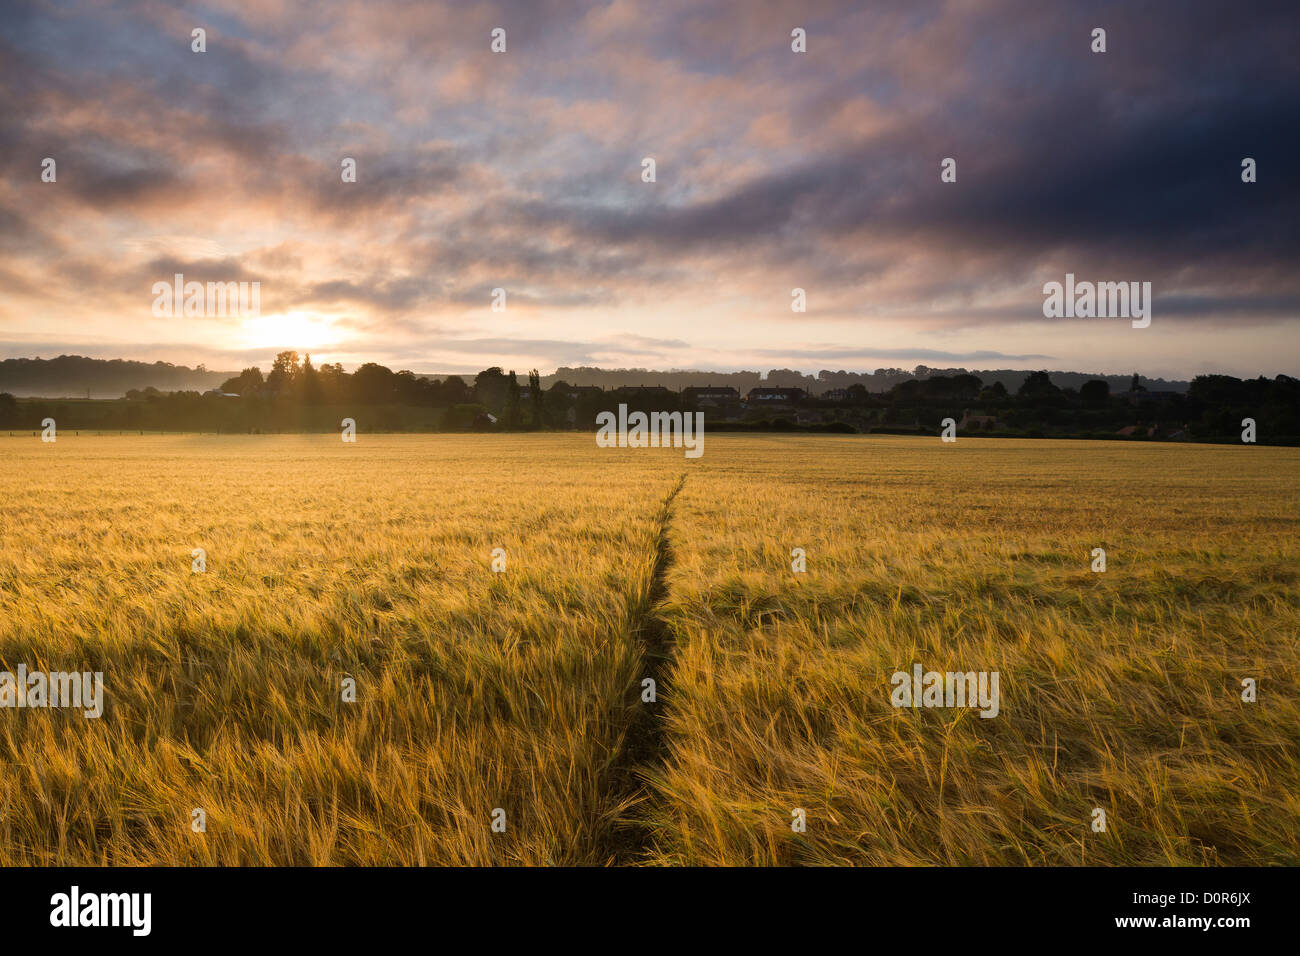 a field of barley at dawn, Milborne Port, Somerset, England, UK - Stock Image